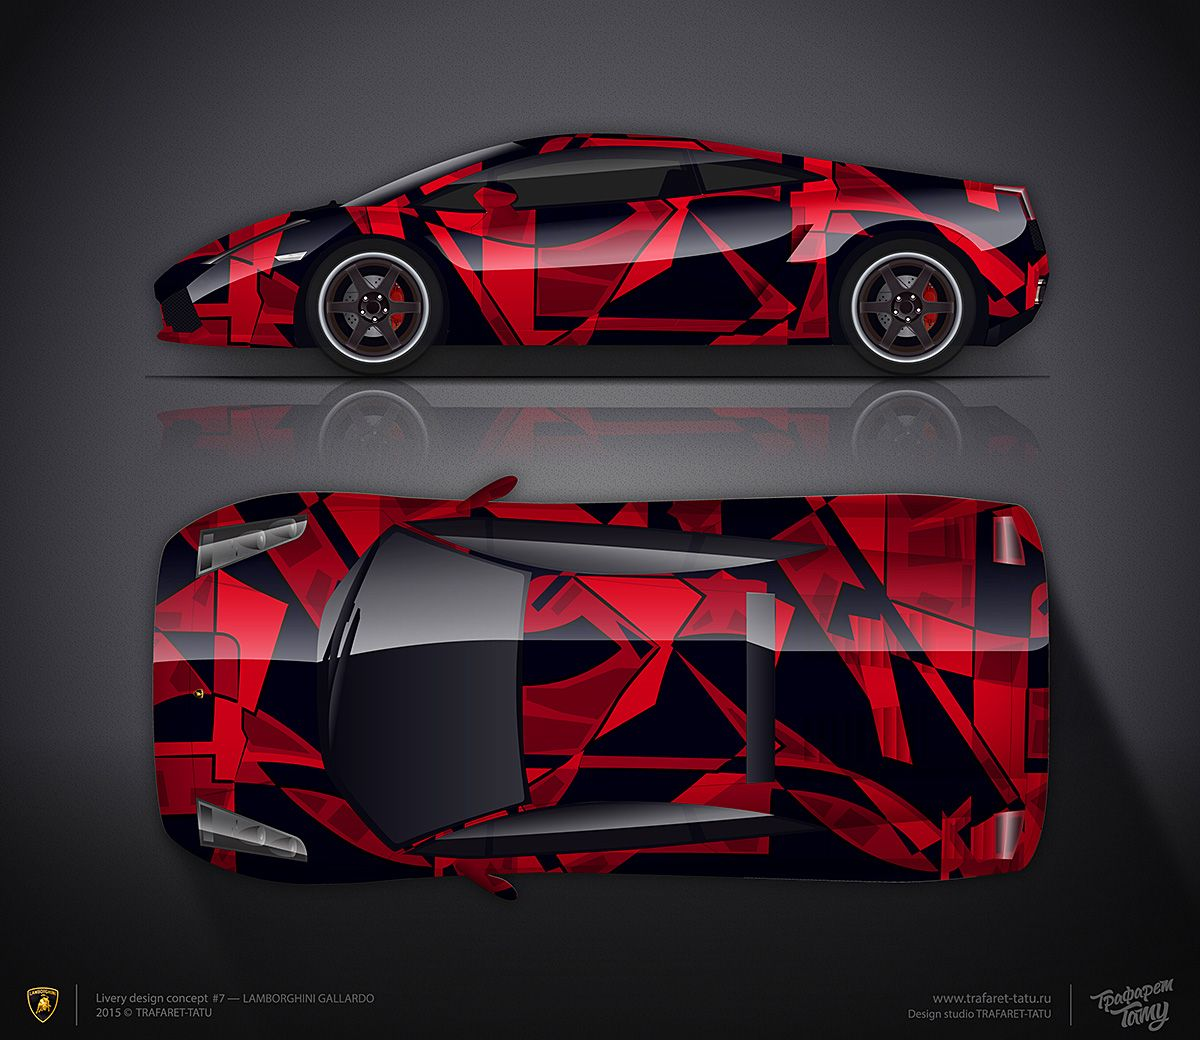 Cheap Used Lamborghini Gallardo For Sale: Design Consept #7 Lamborghini Gallardo For Sale